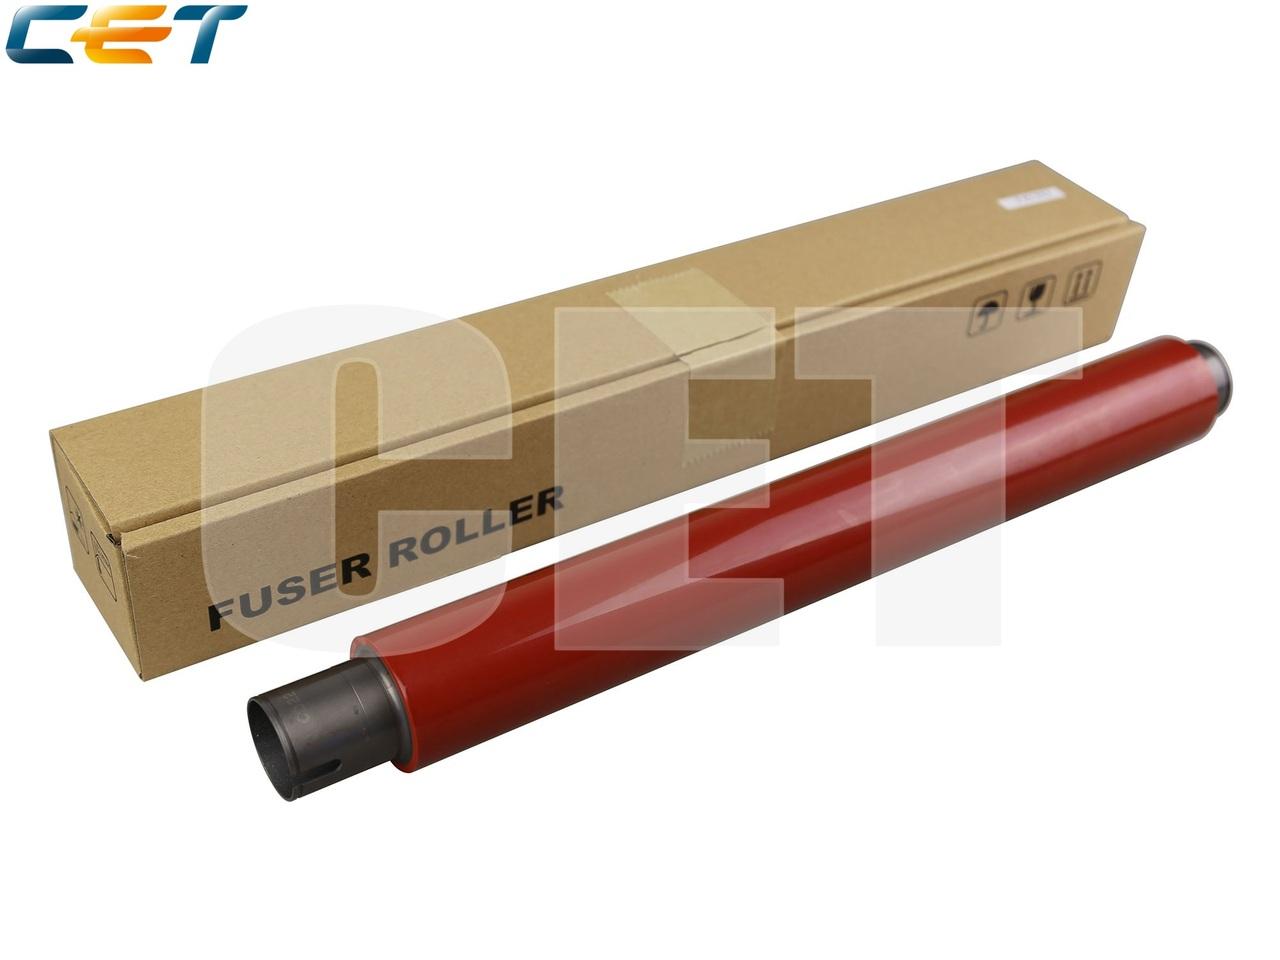 Тефлоновый вал NROLM1748FCZZ для SHARPMX-2600N/3100N (CET), CET7630